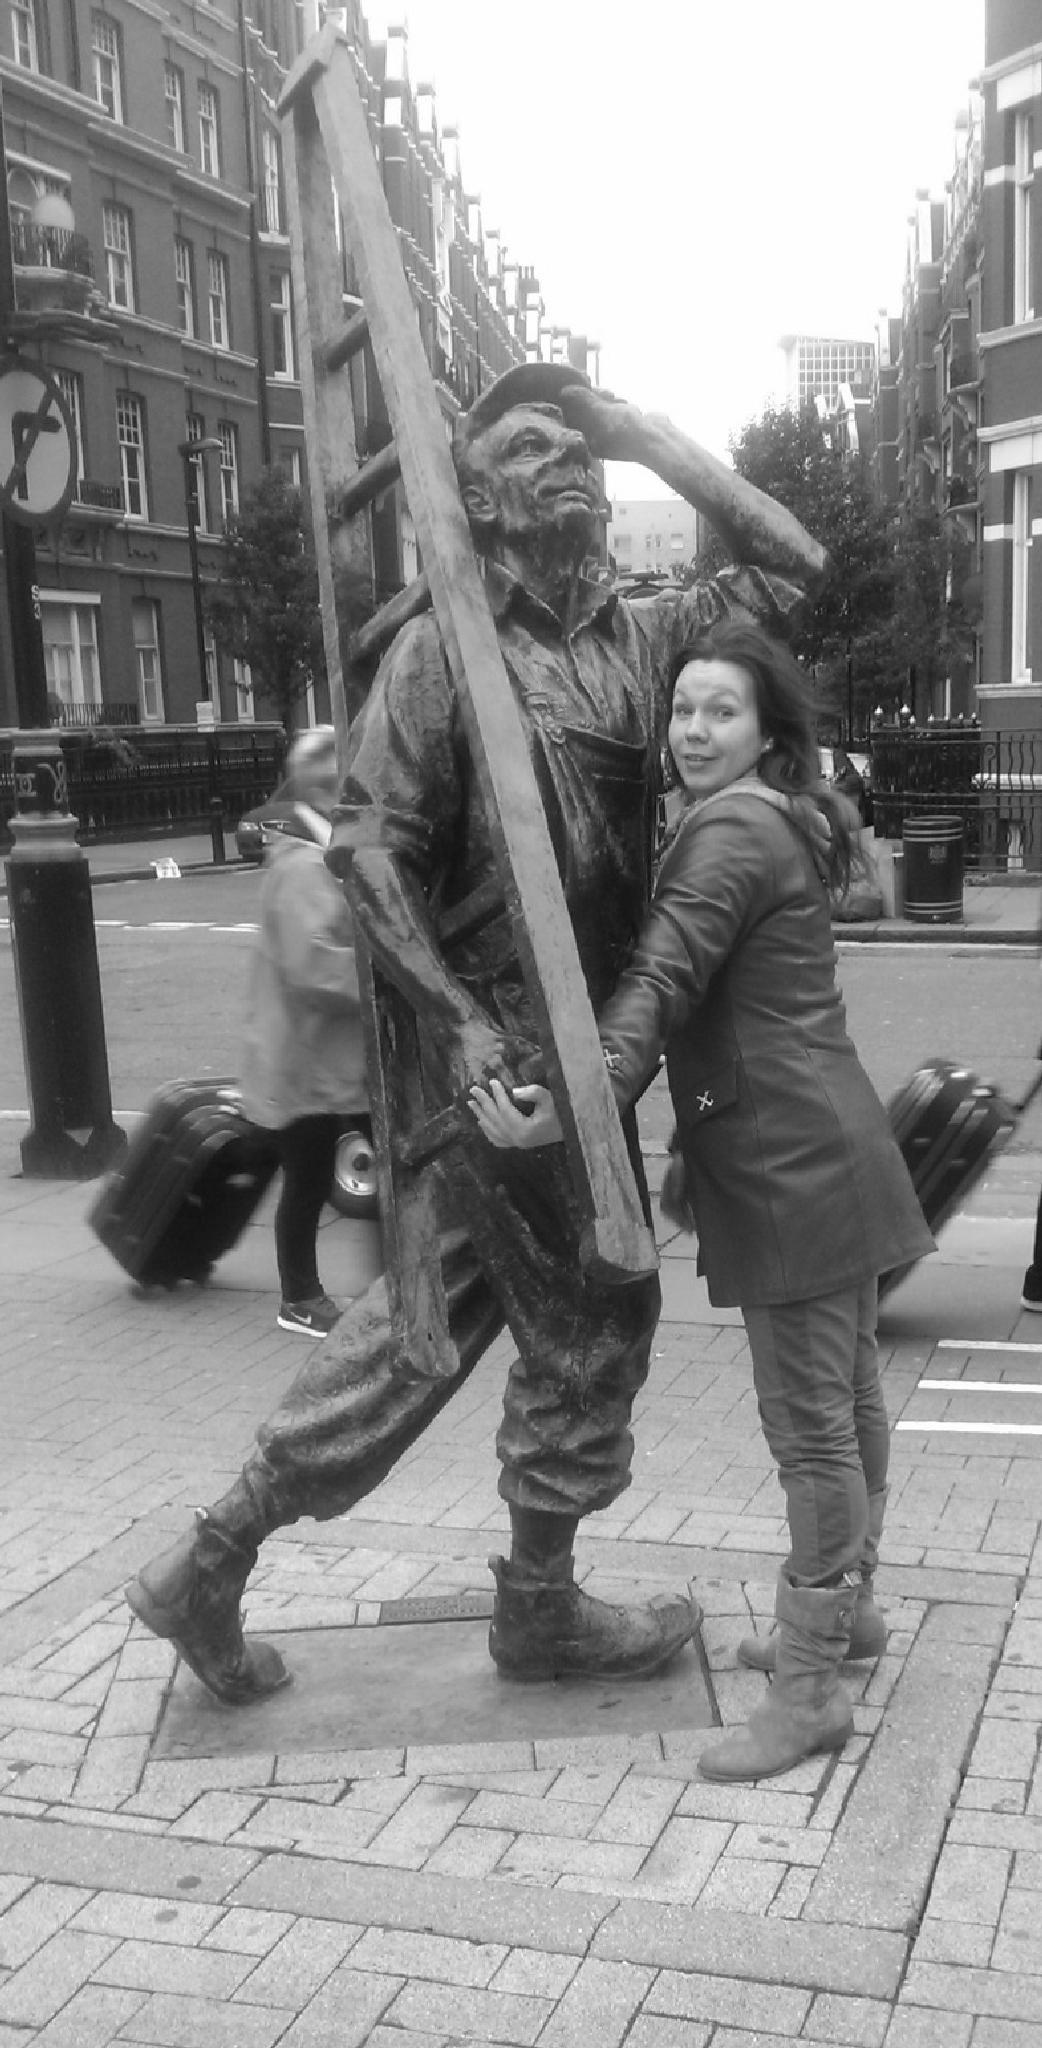 Monument in London. by Jolanta Sarmule